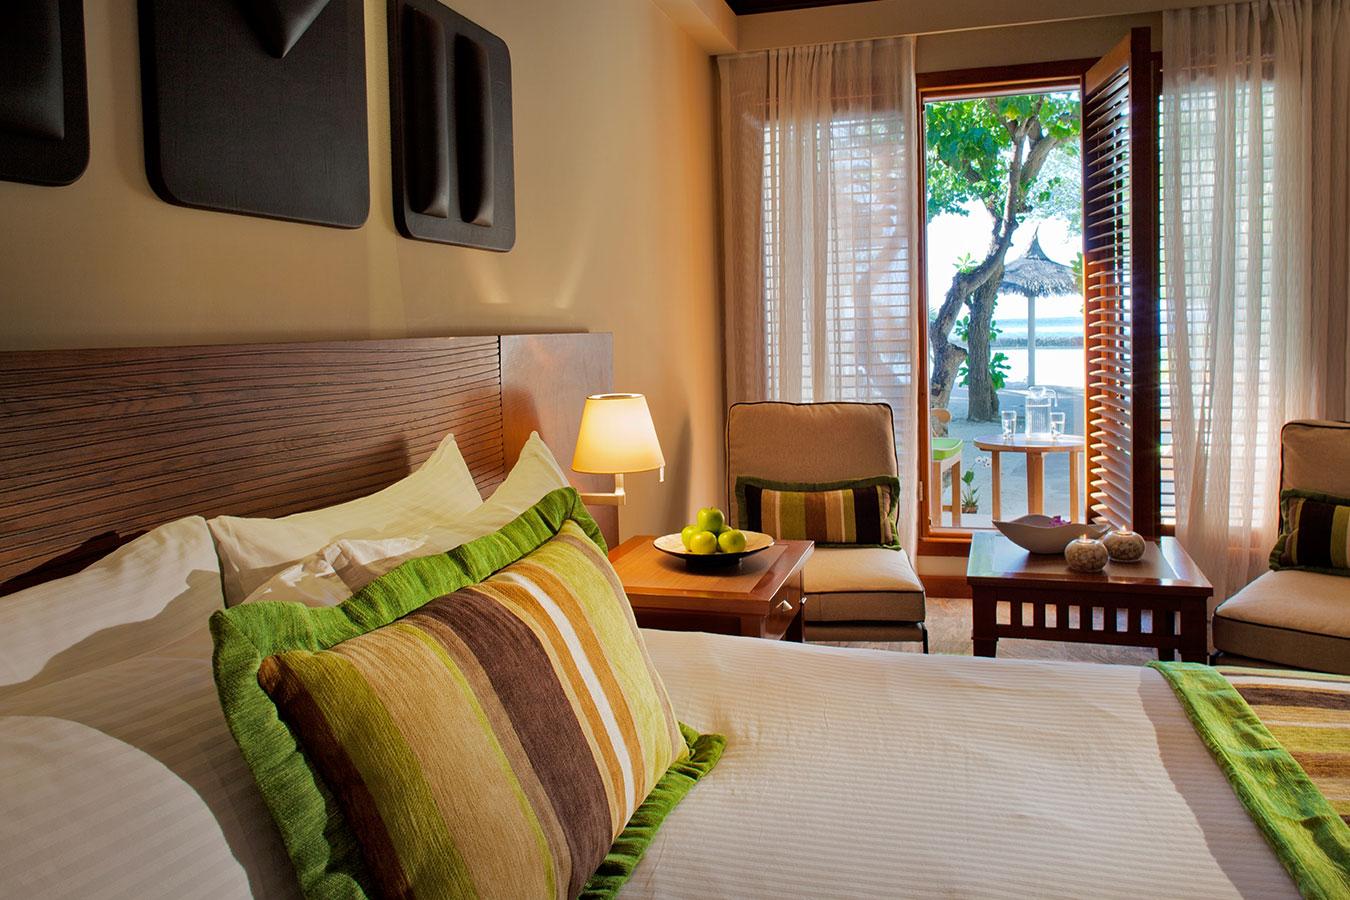 Kurumba Maldives - Deluxe Room Bedroom image  - Maldives Resort